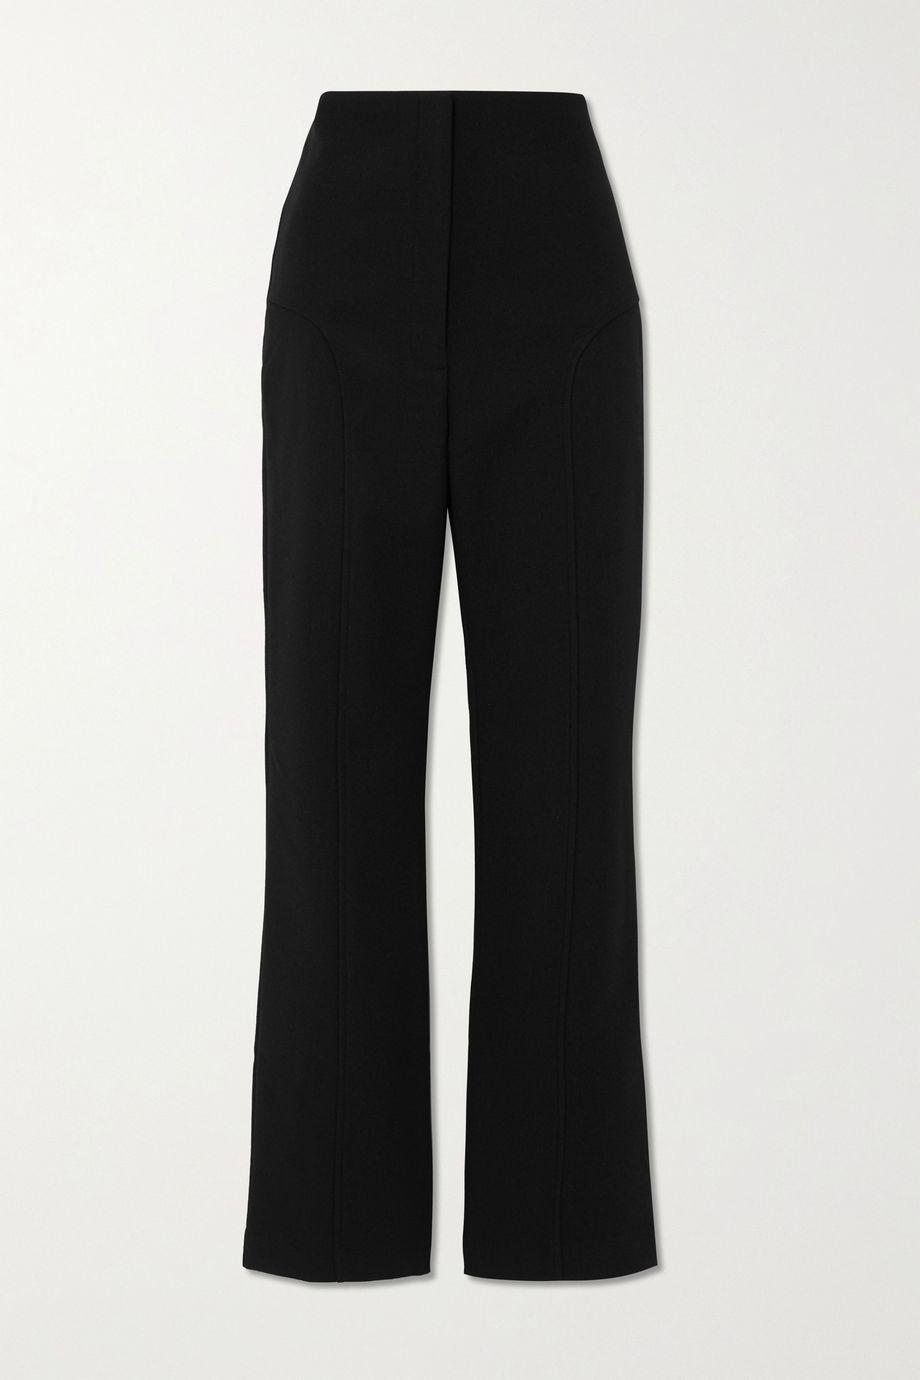 Paris Georgia Paneled crepe bootcut pants